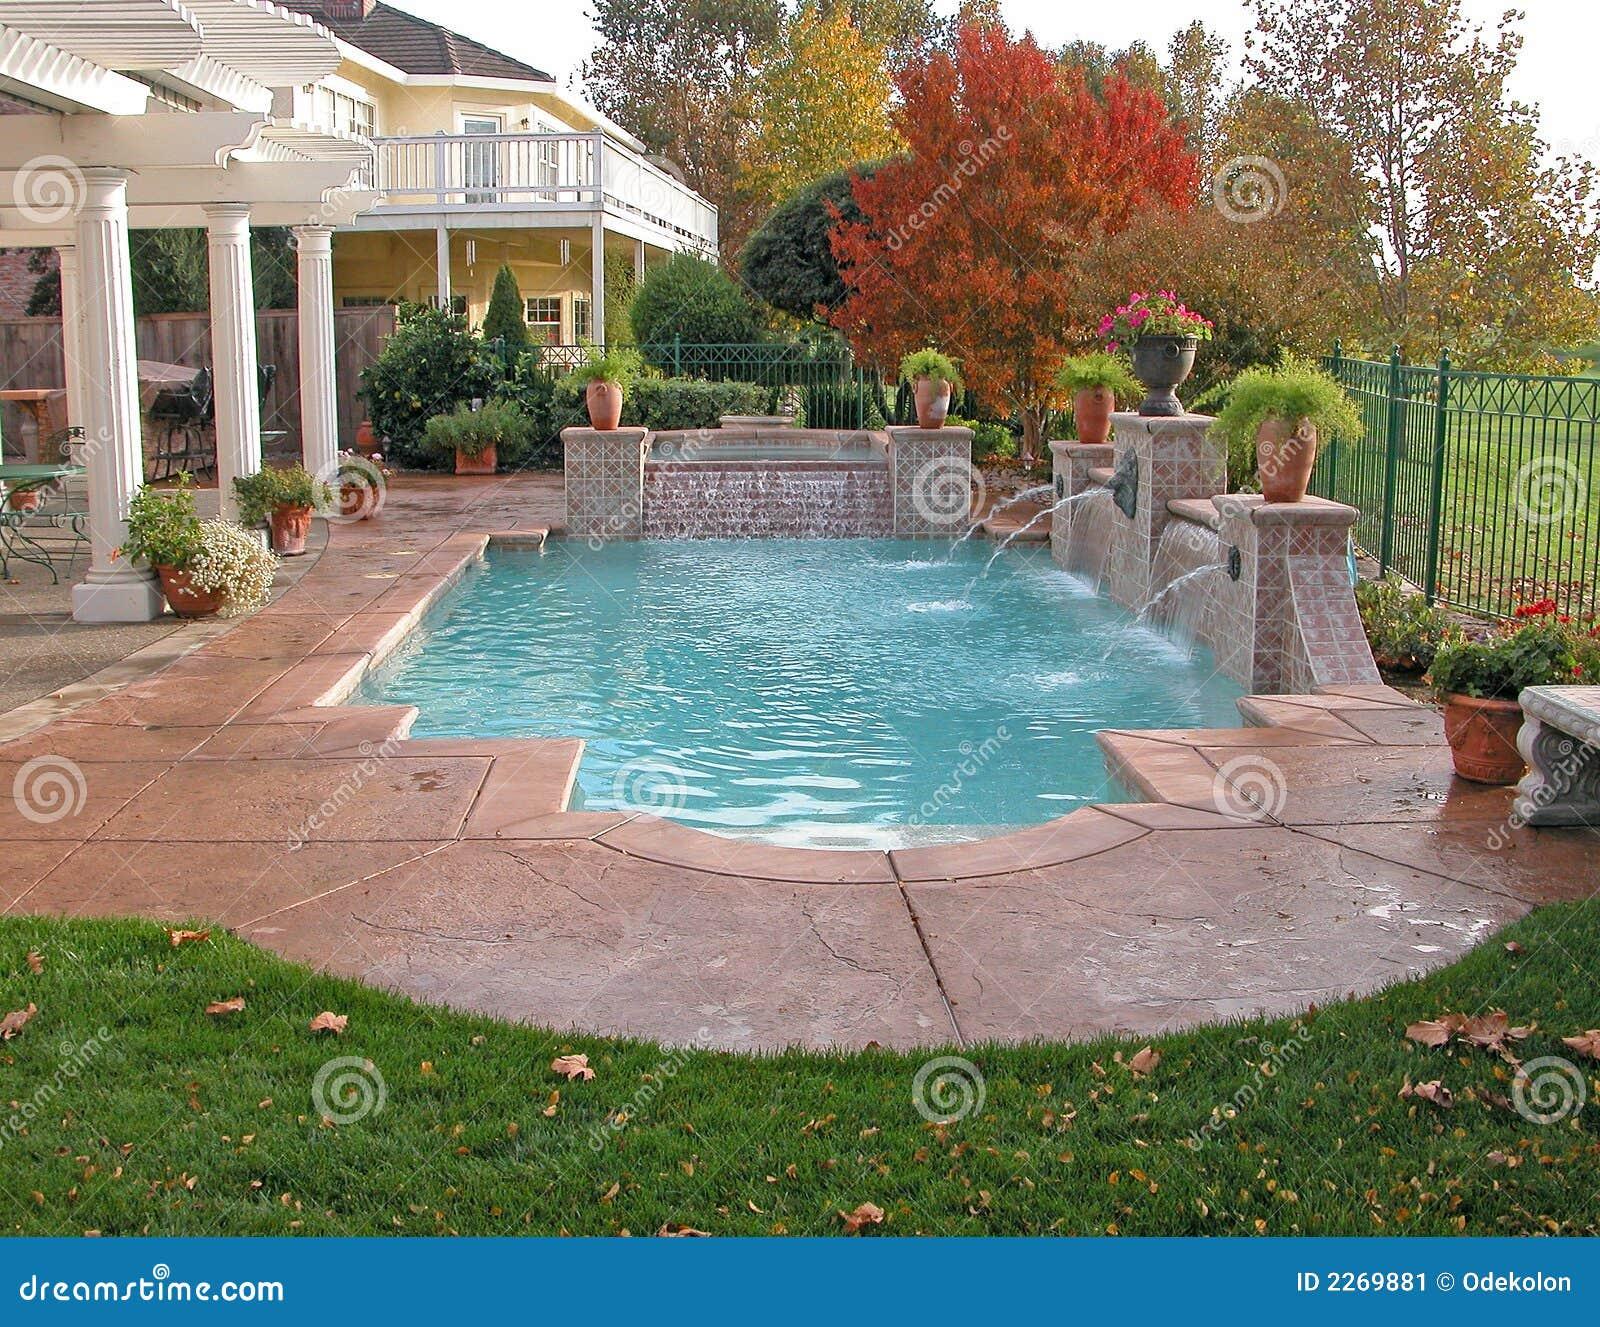 Backyard View Stock Image